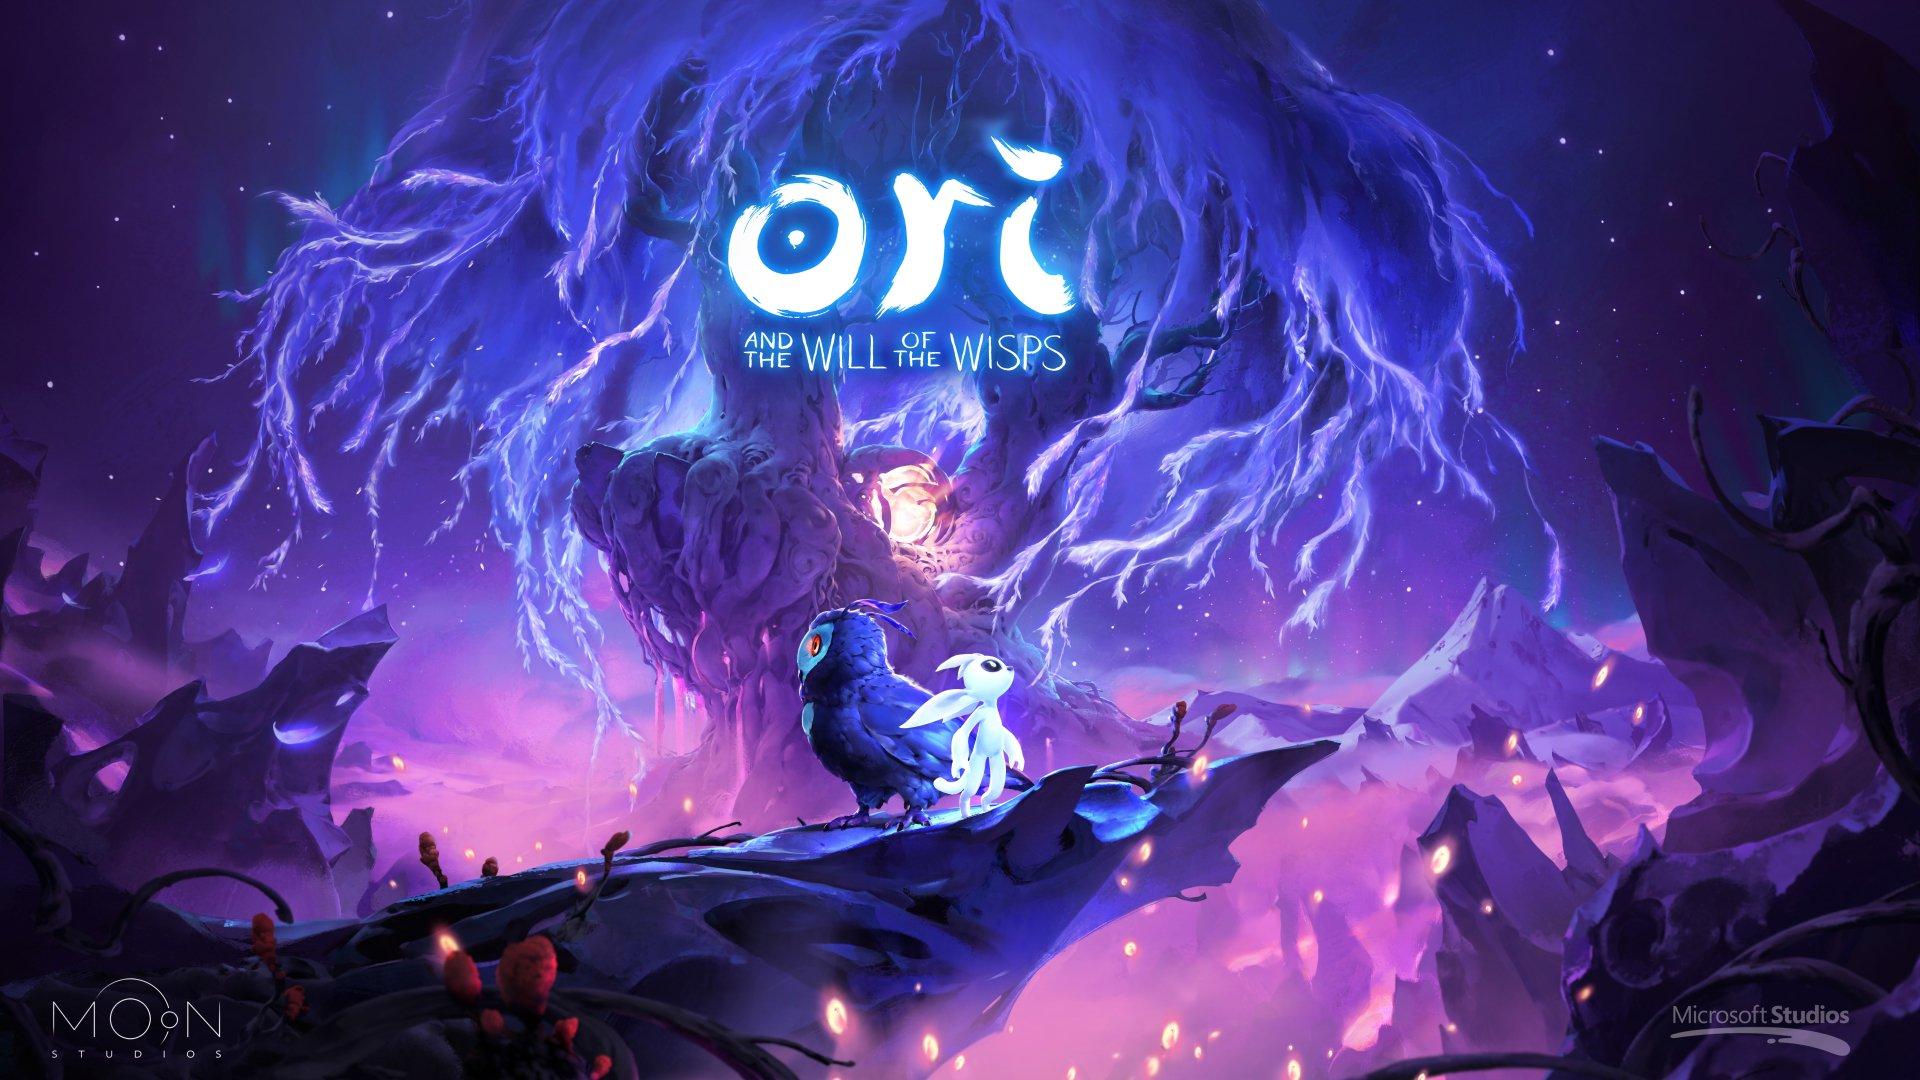 Photo of إنتهاء عملية تطوير لعبة Ori and the Will of the Wisps واللعبة أصبحت ذهبية .